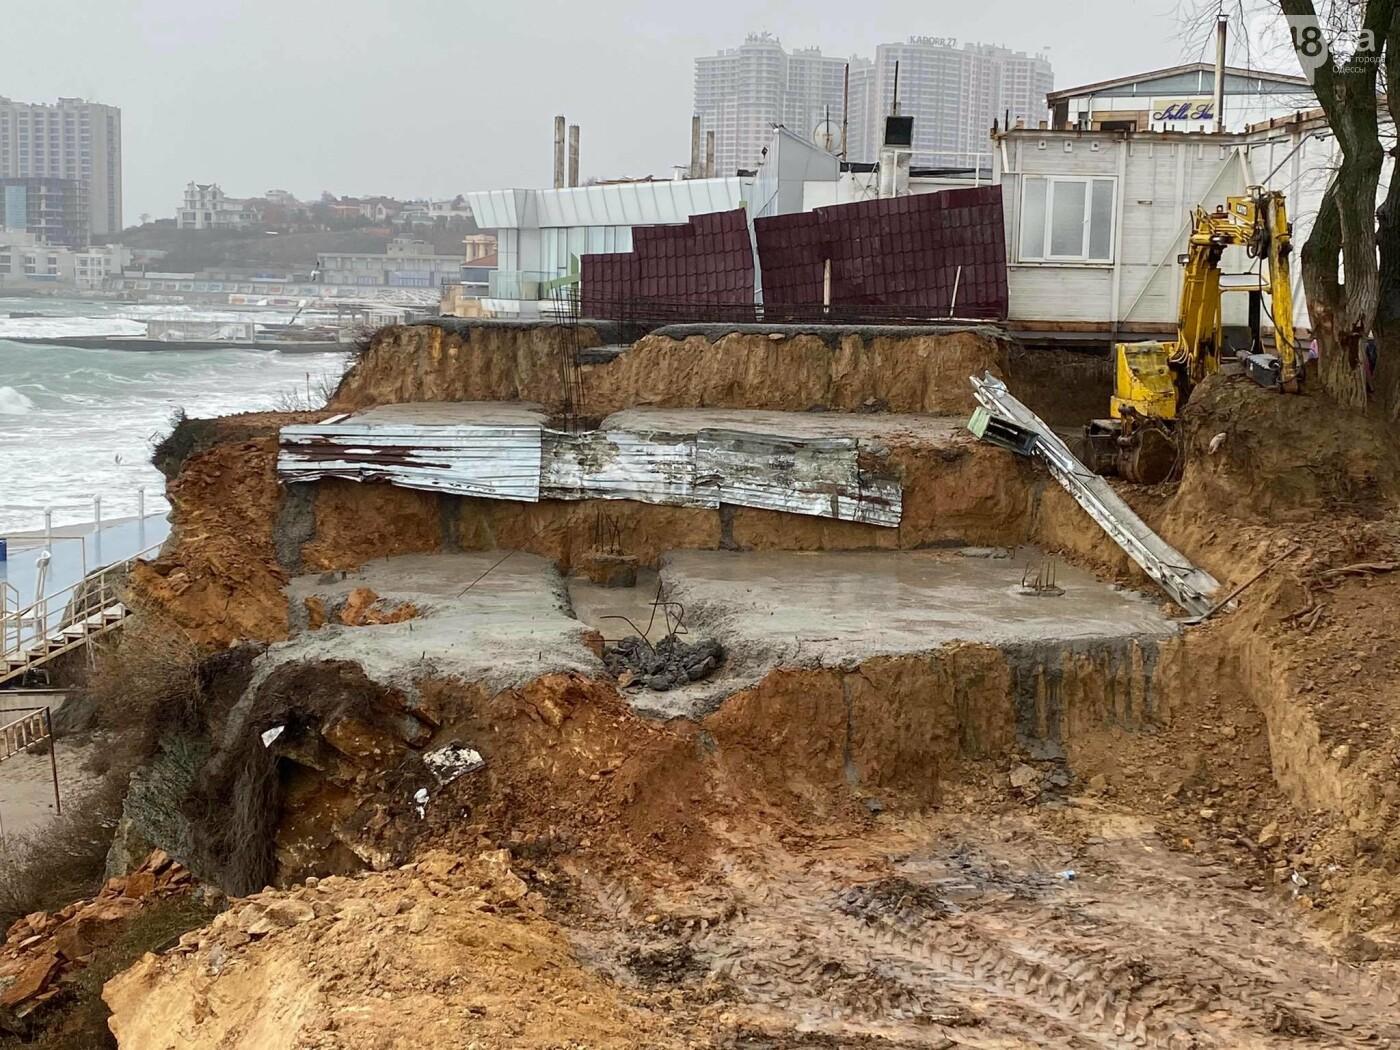 В Аркадии на побережье активист нашел незаконную стройку,- ФОТО, ВИДЕО, фото-2